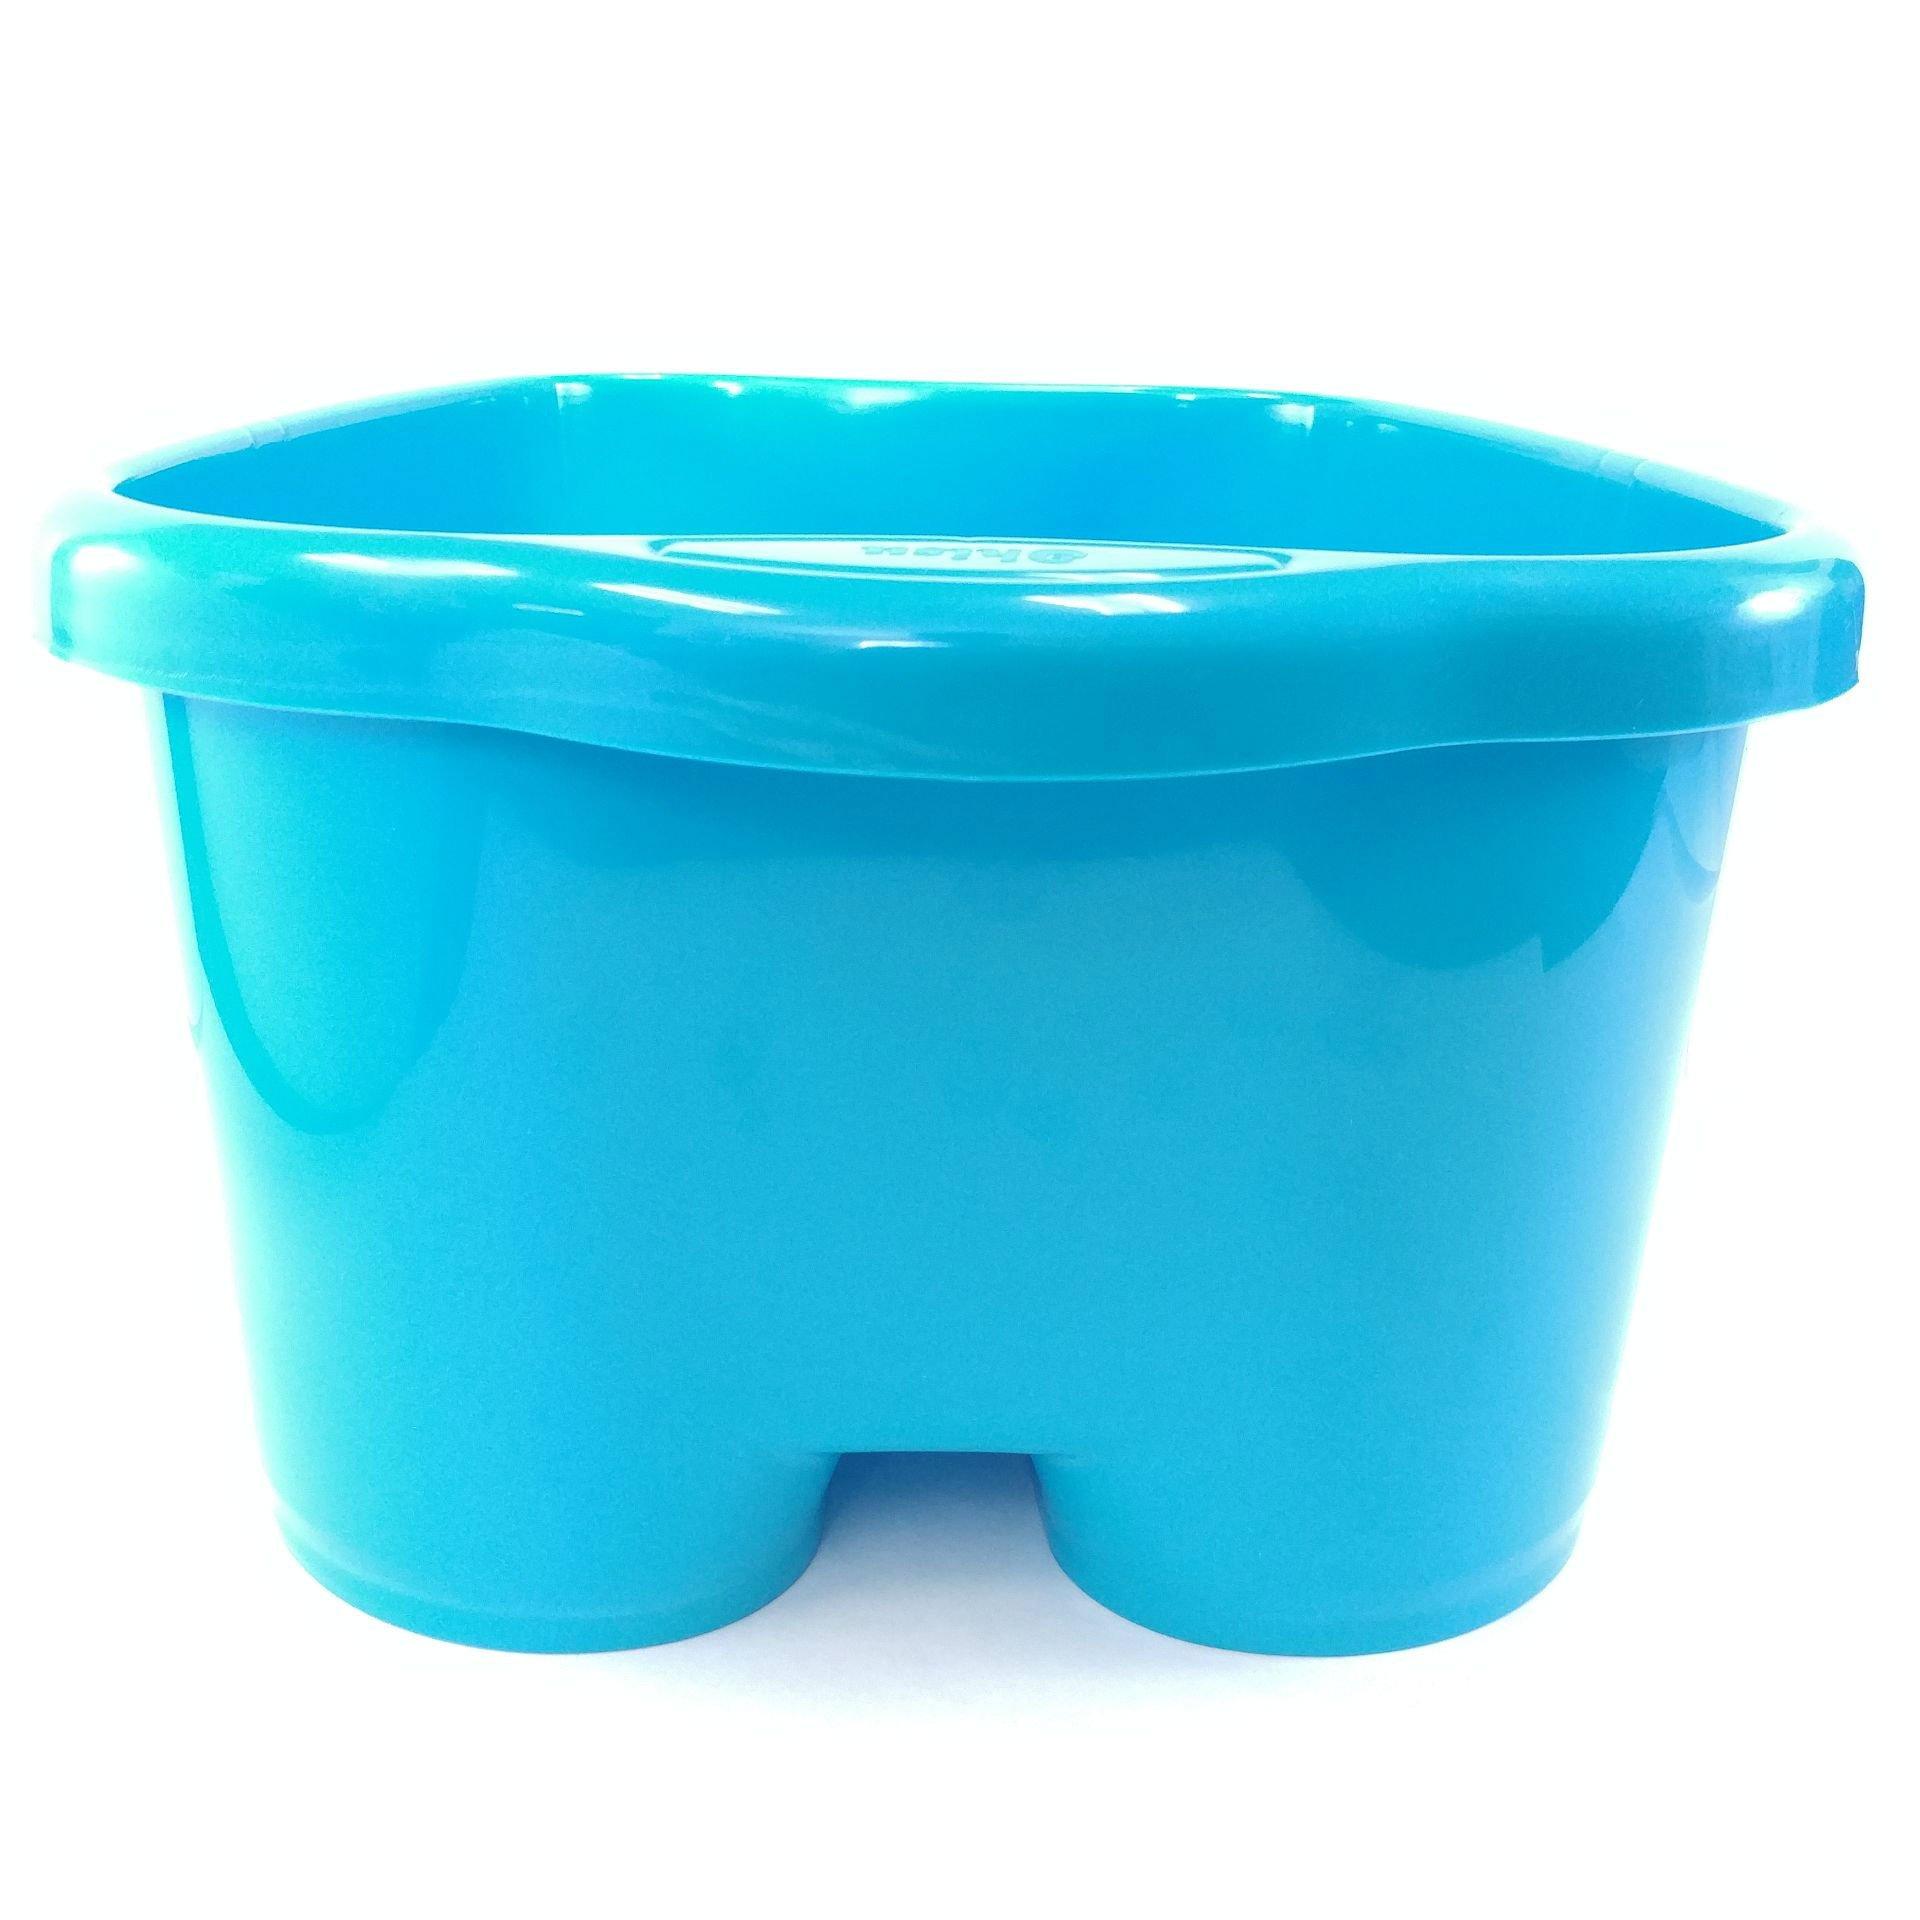 Ohisu Blue Foot Basin for Foot Bath, Soak, or Detox by Ohisu (Image #4)